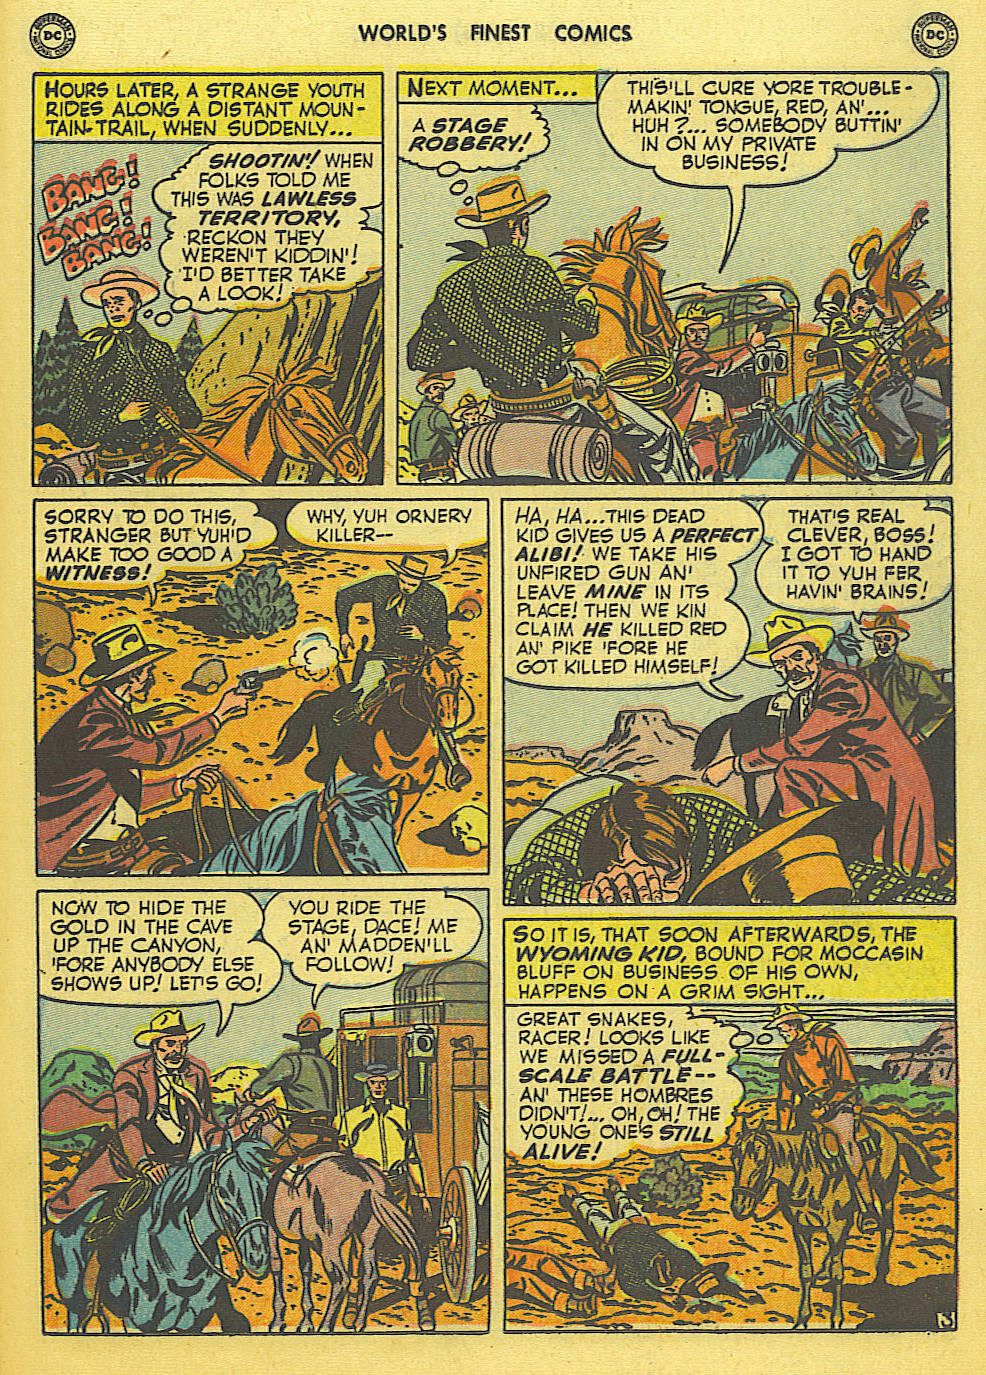 Read online World's Finest Comics comic -  Issue #49 - 42